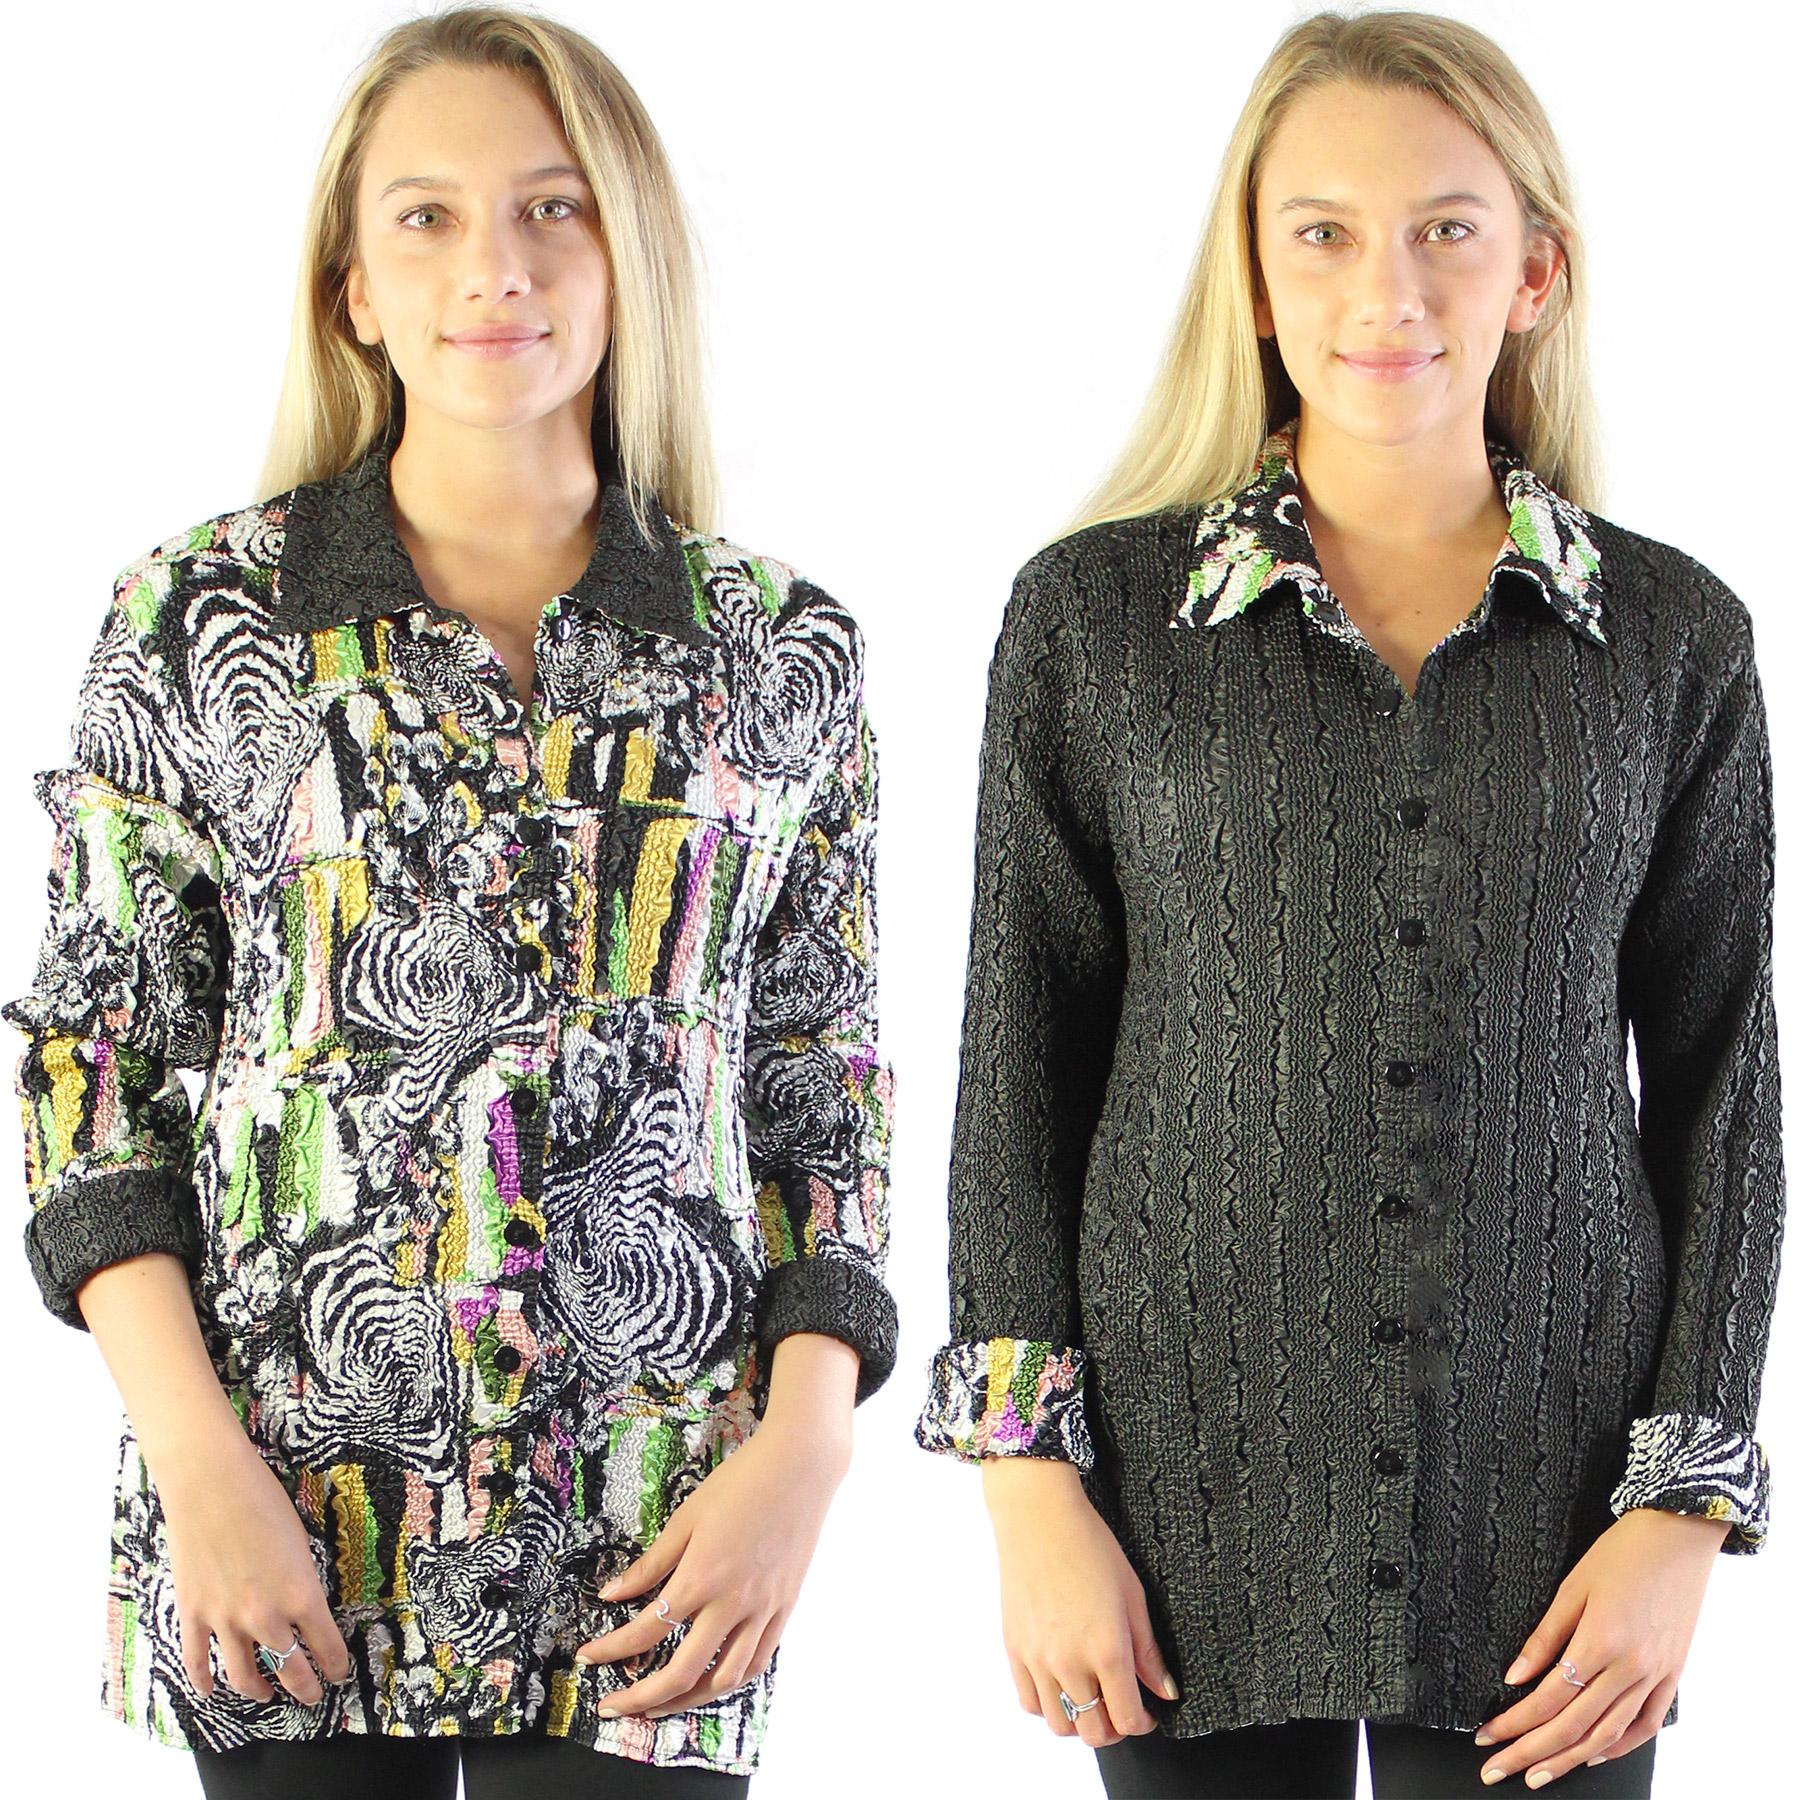 Wholesale Magic Crush - Reversible Jackets #14013 - L-XL